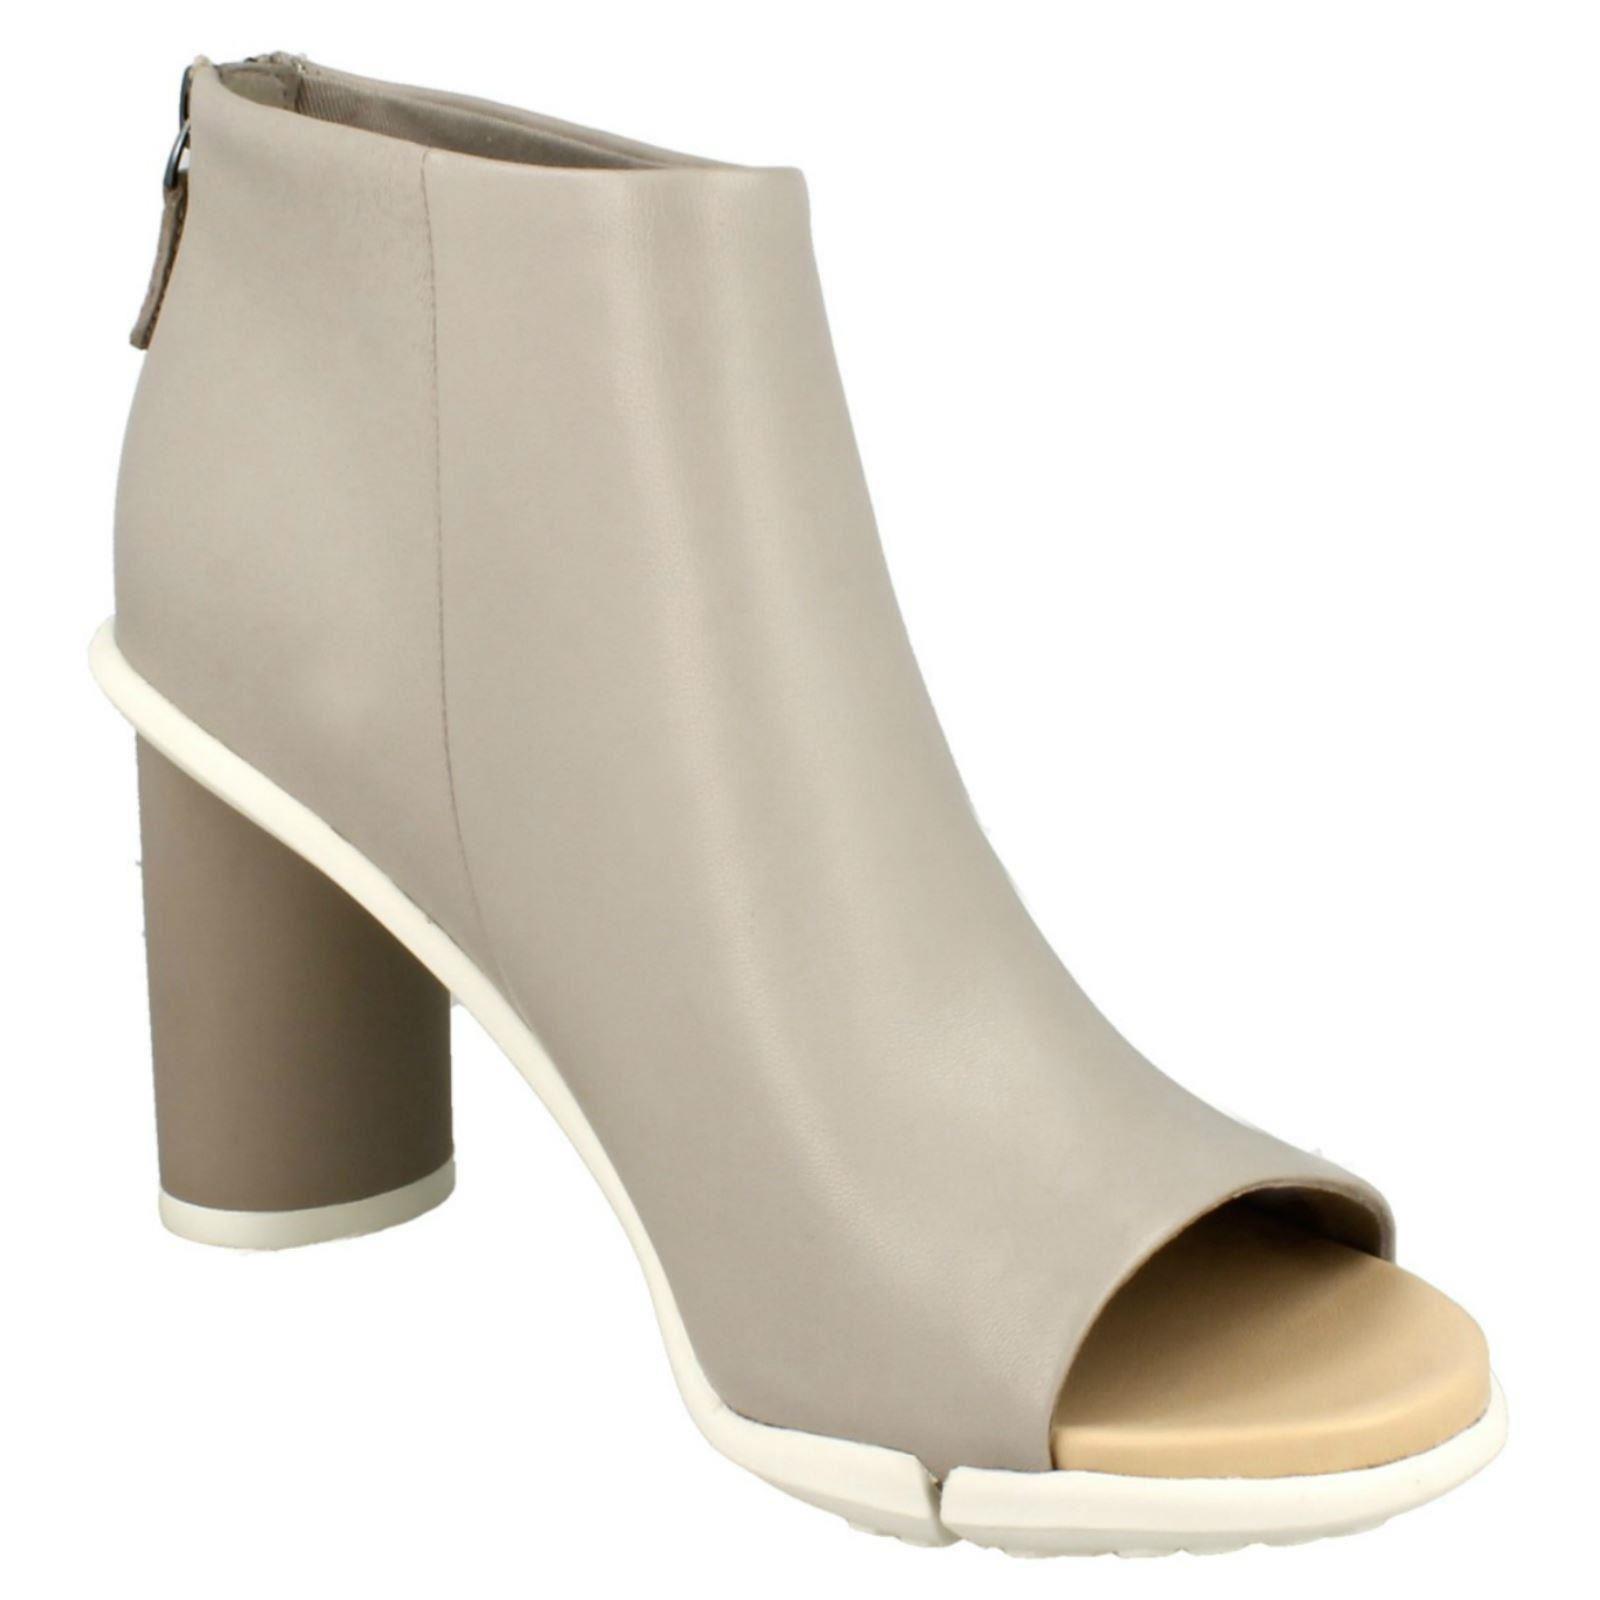 Damas Clarks Imali Peonía Peonía Peonía Peep Toe botas 8d6d35